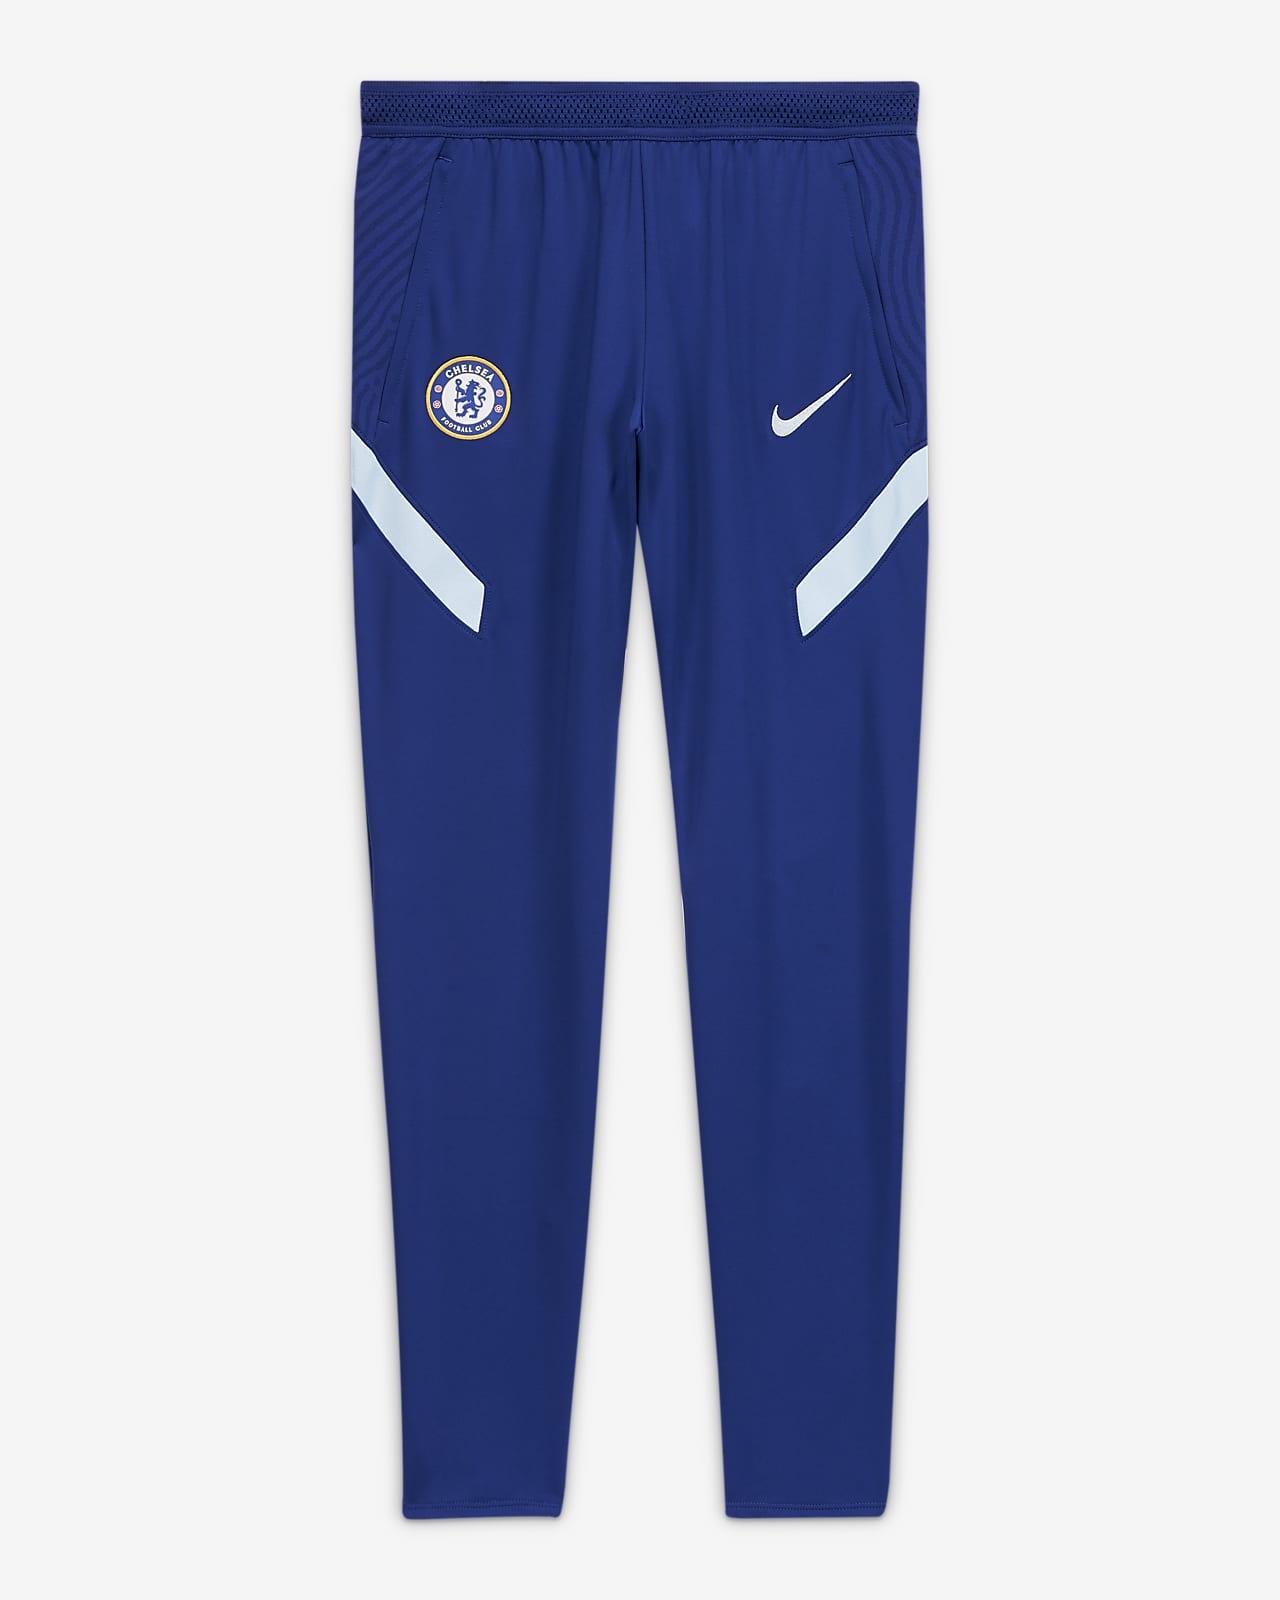 Pantalones de fútbol para hombre Chelsea FC Strike